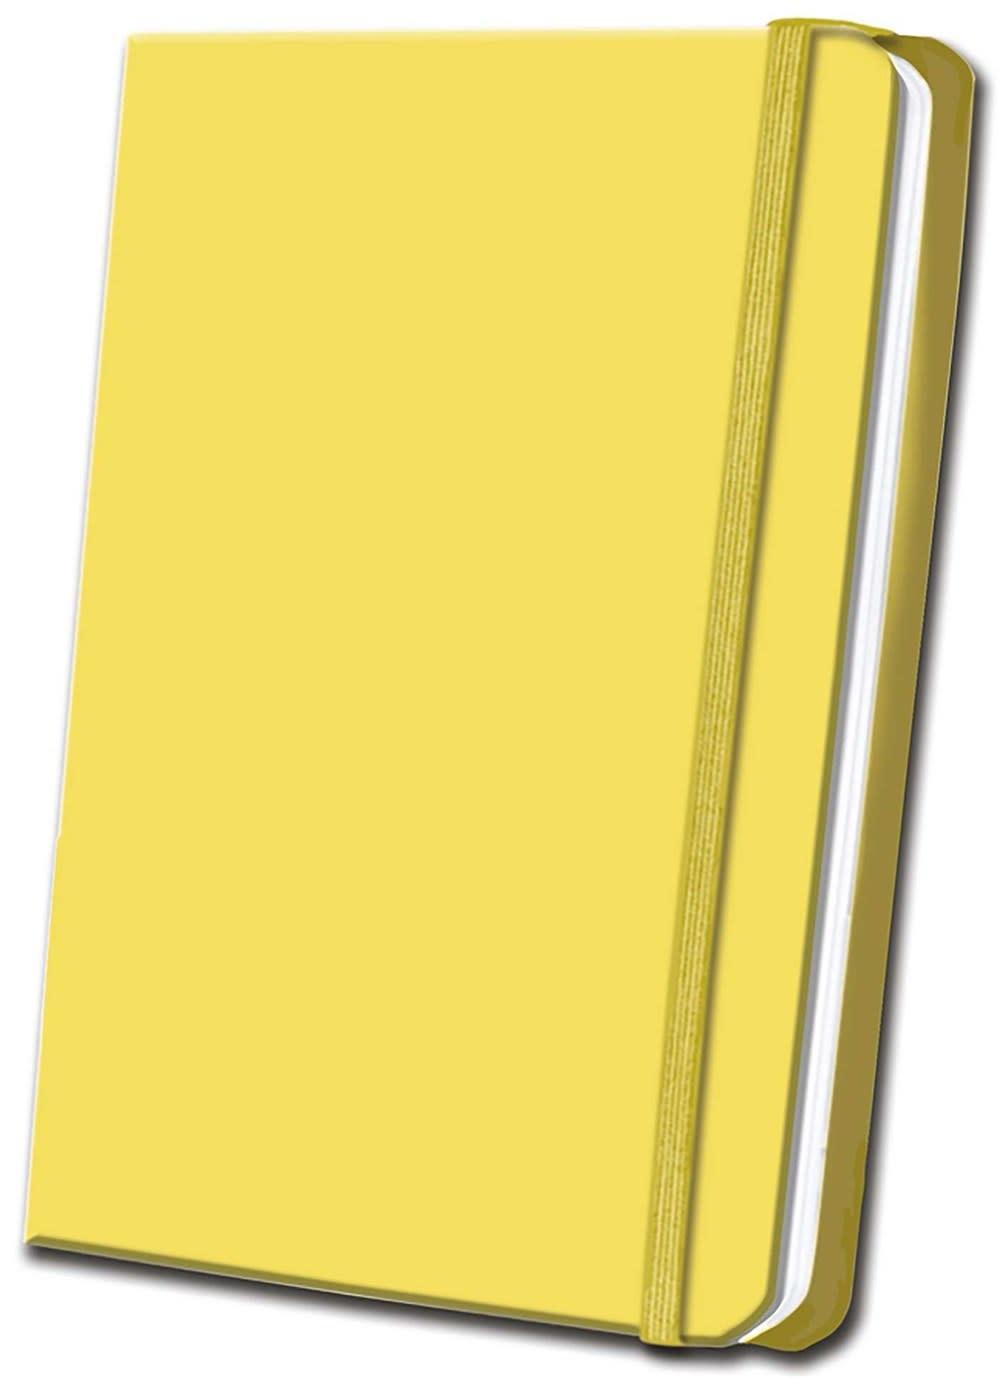 Thunder Bay Press Yellow Linen Journal